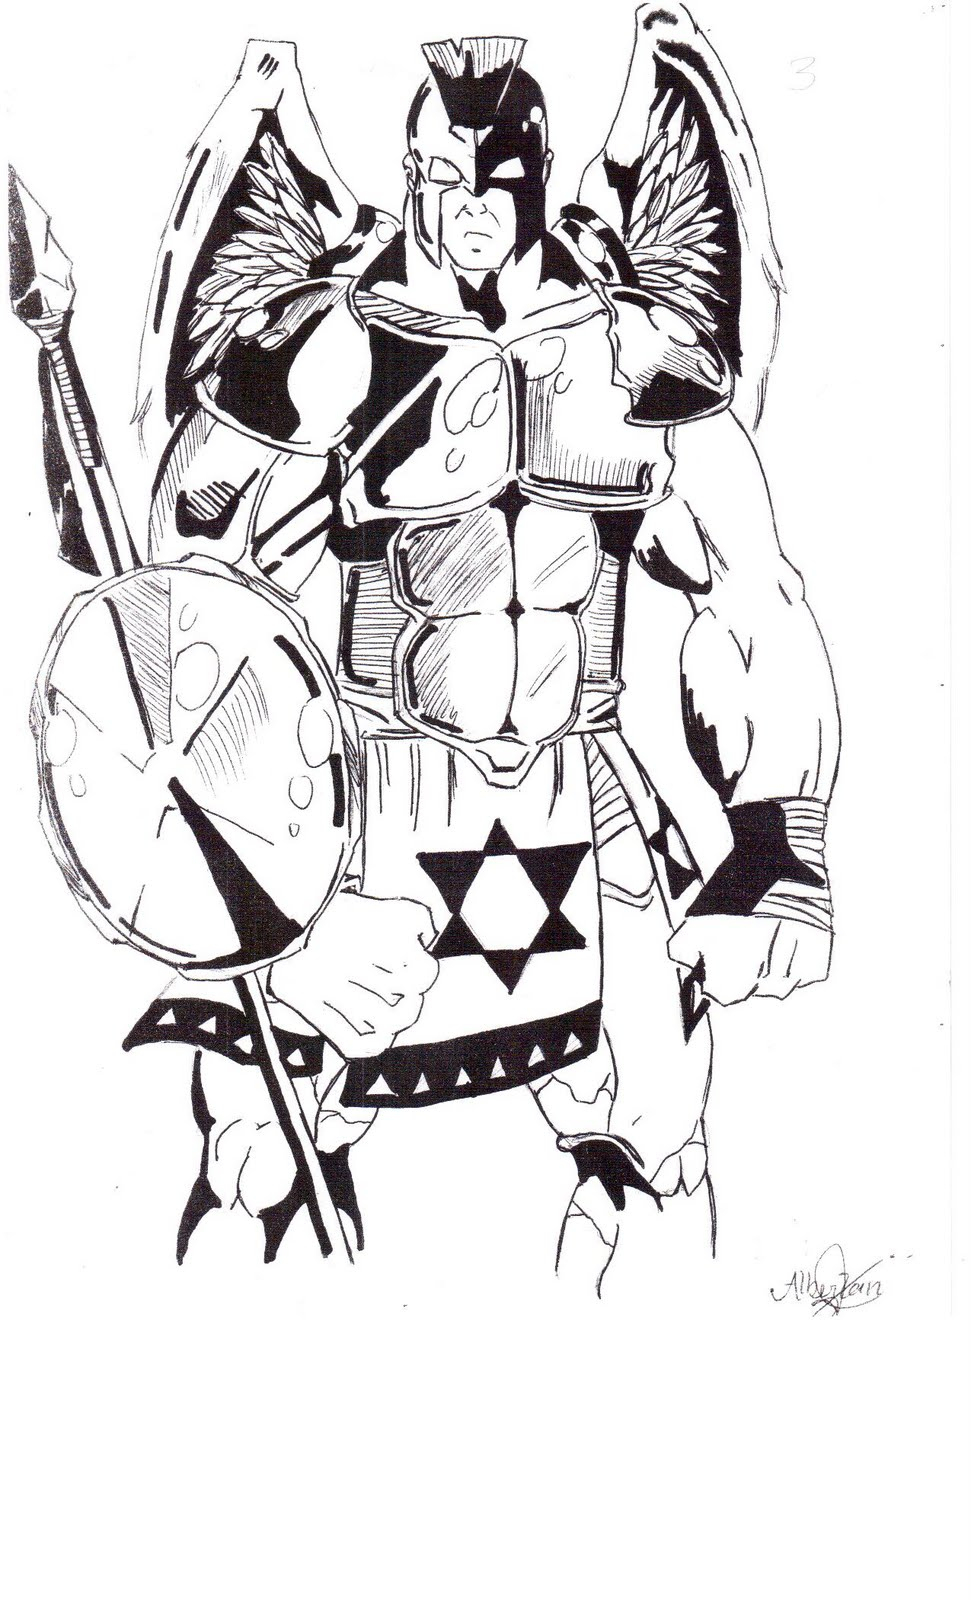 Gladiadores ~ Alberlan Desenhos Mangá pour Gladiateur Dessin